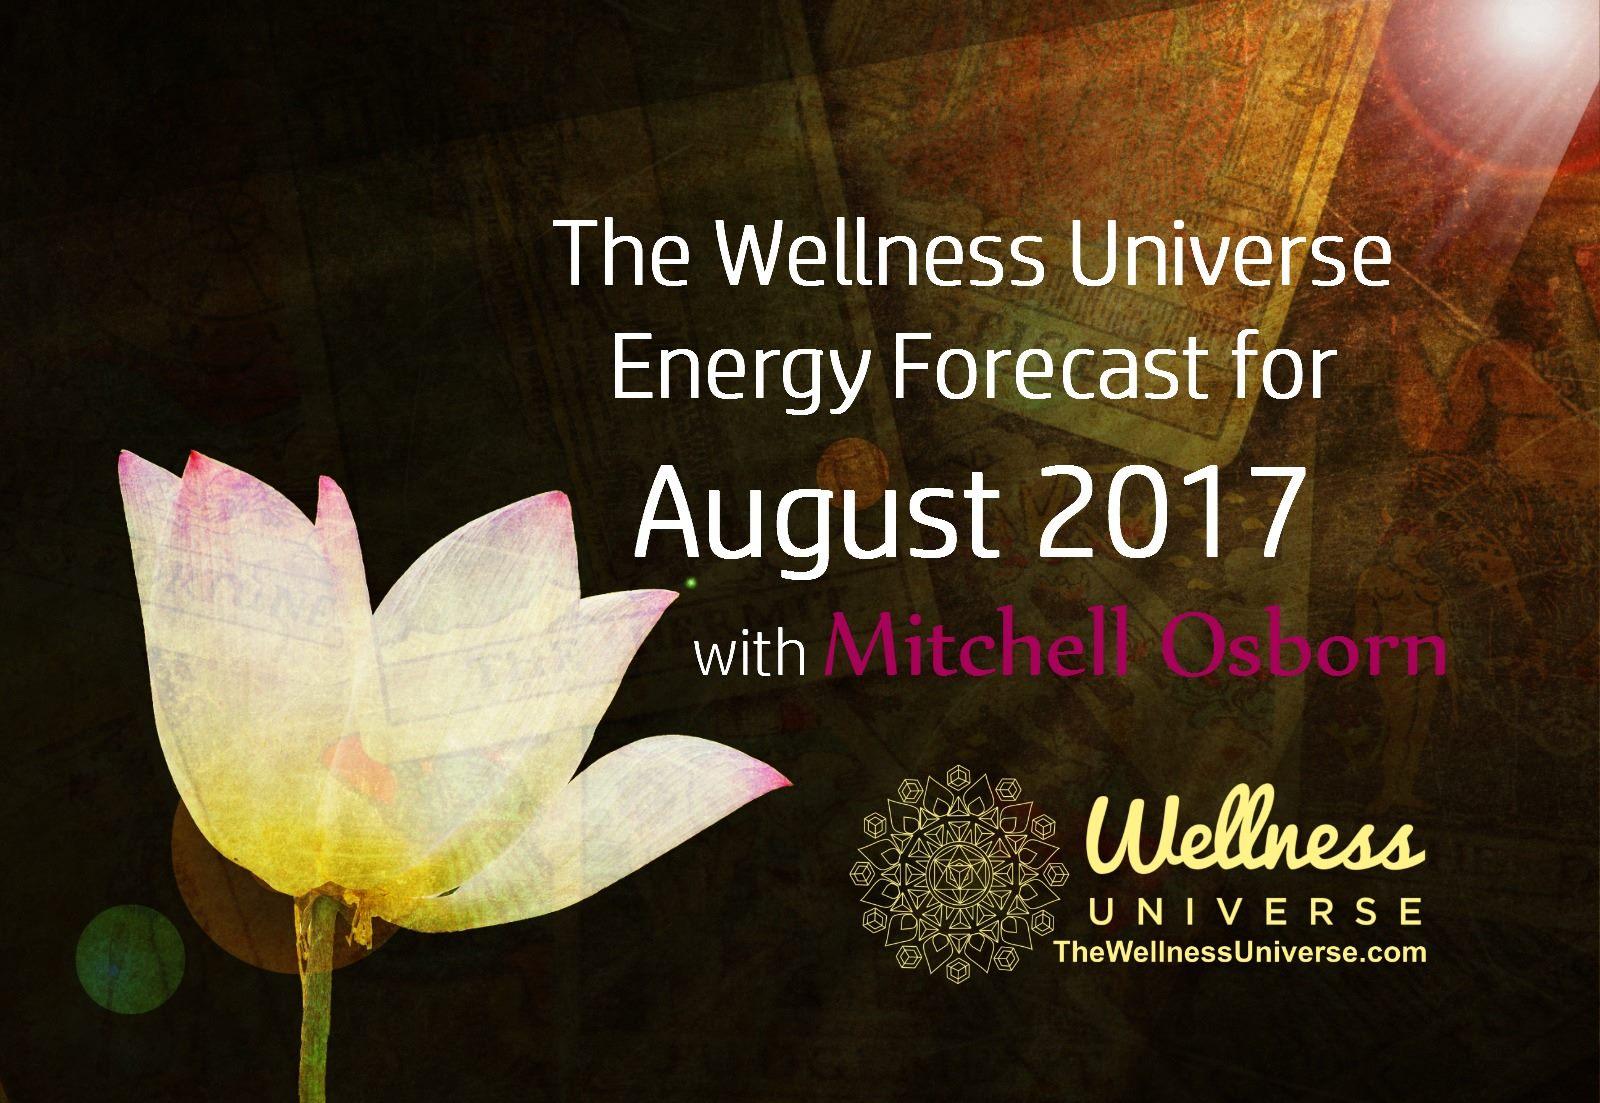 Energy Forecast for August with Mitchell Osborn #TheWellnessUniverse #WUVIP #EnergyForecastForAugust